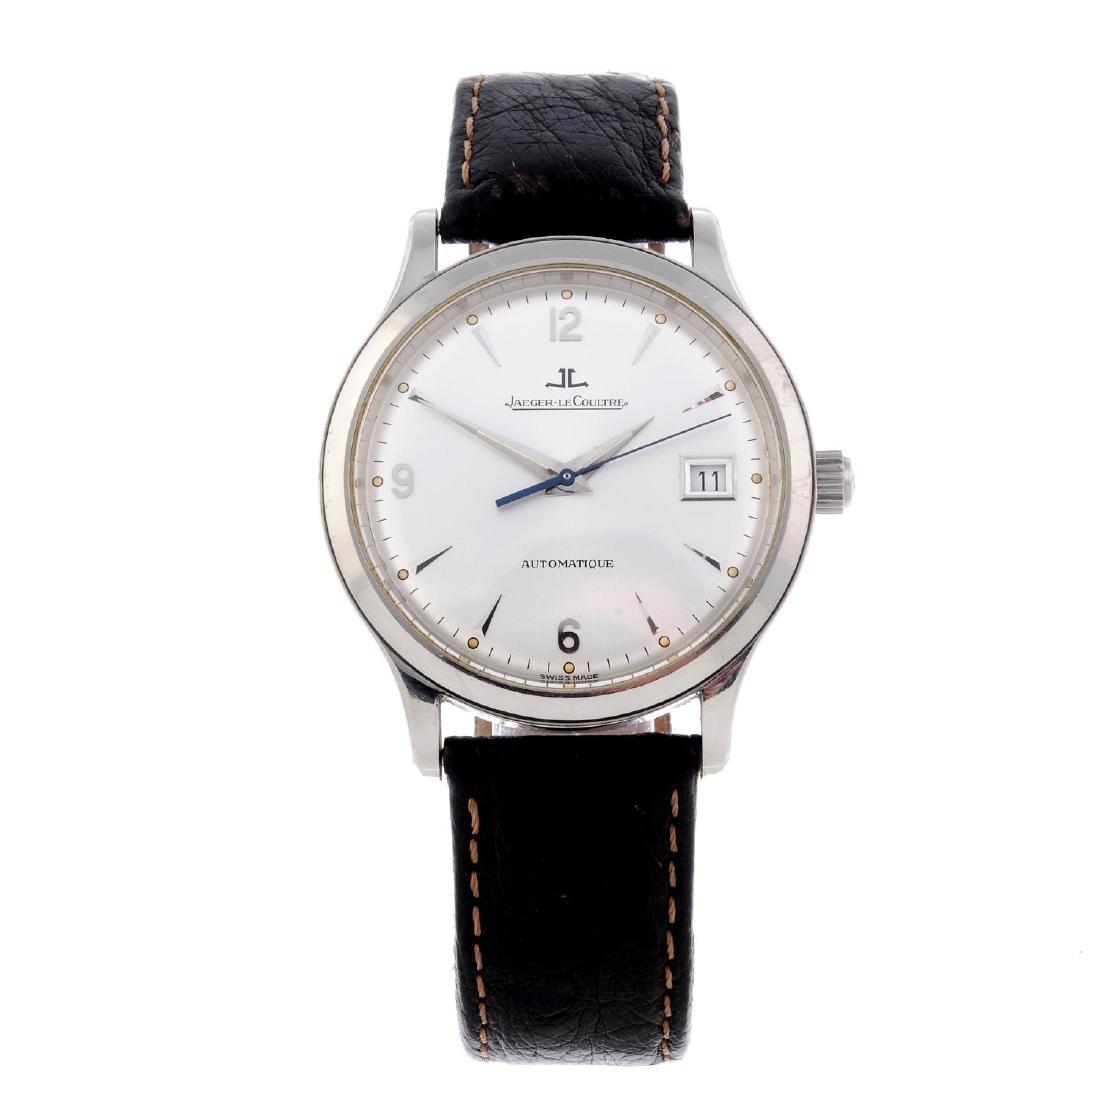 JAEGER-LECOULTRE - a gentleman's Master Control wrist